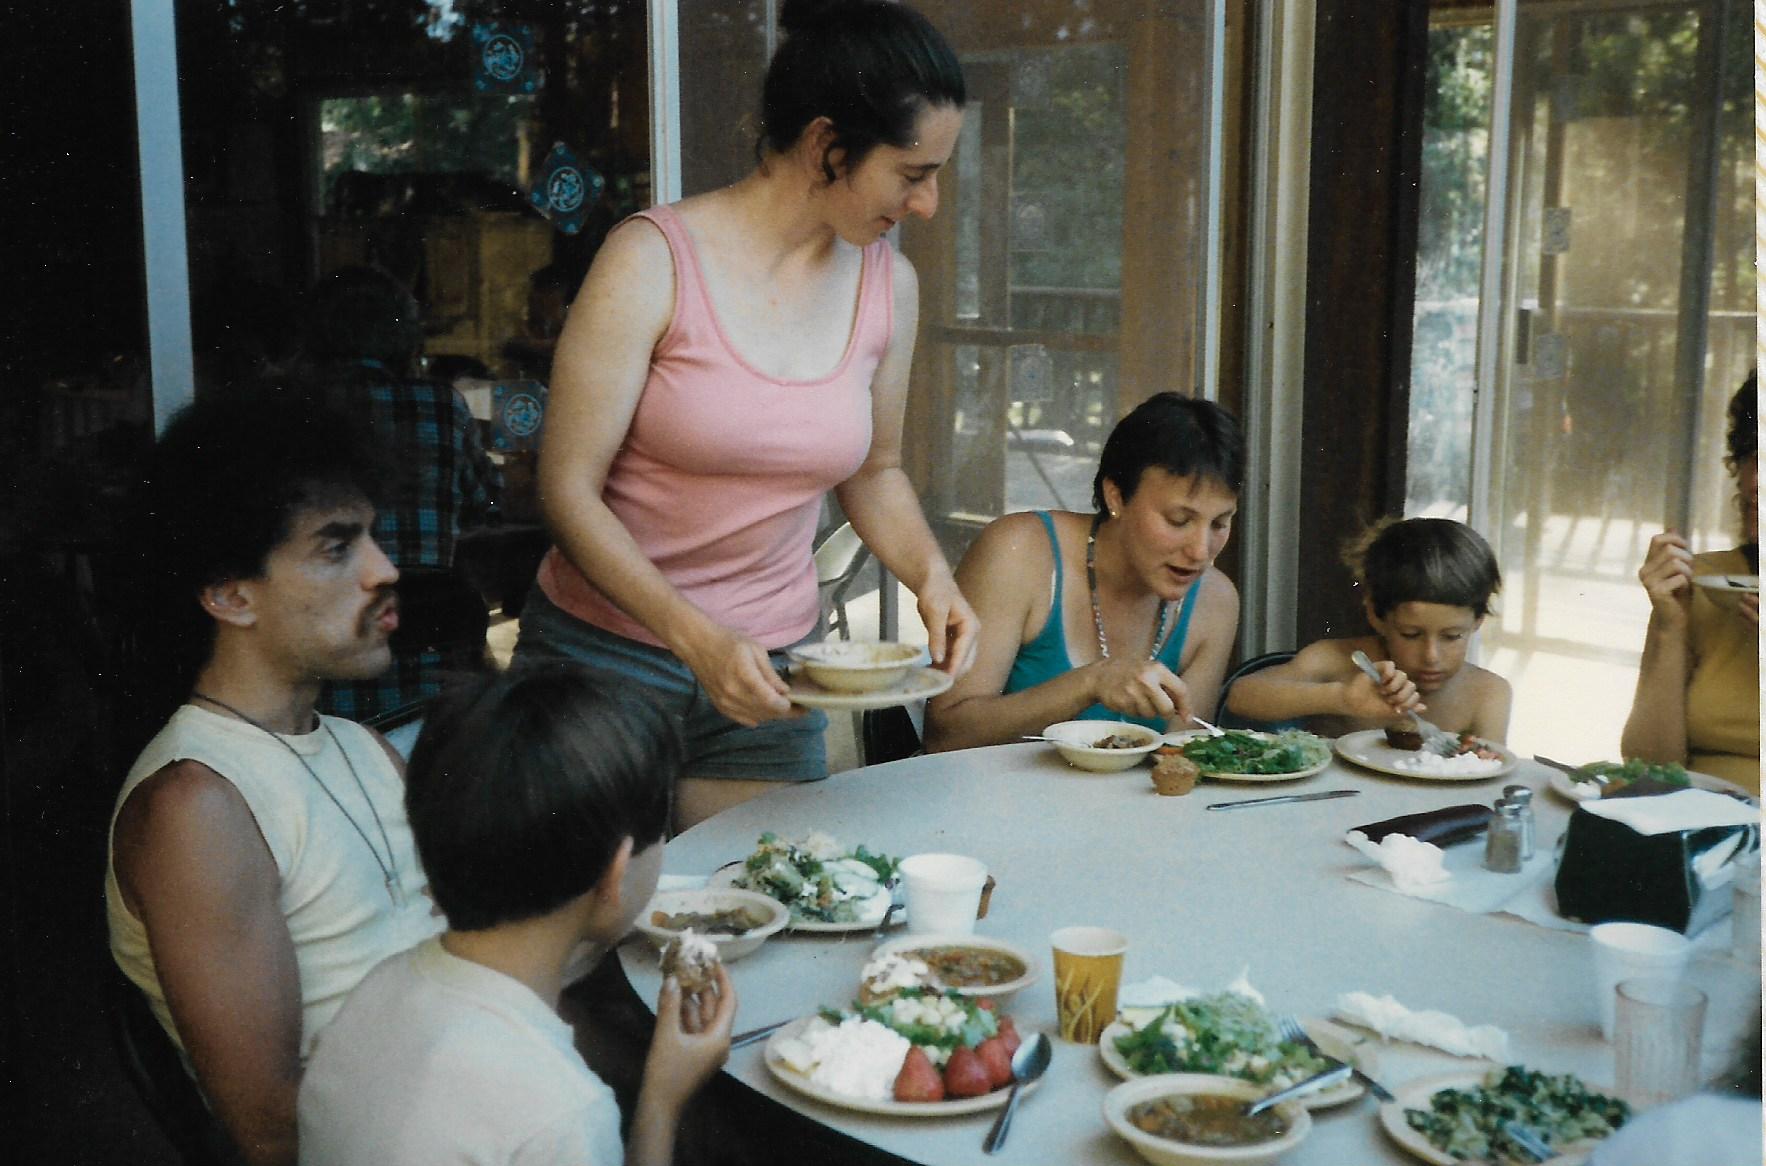 87 Joys  Jeff Celnik, Maya Wallach, Rosiland Glazer, Elishama Goldfarb, a littile of Linda Elyad, meal time copy.jpeg